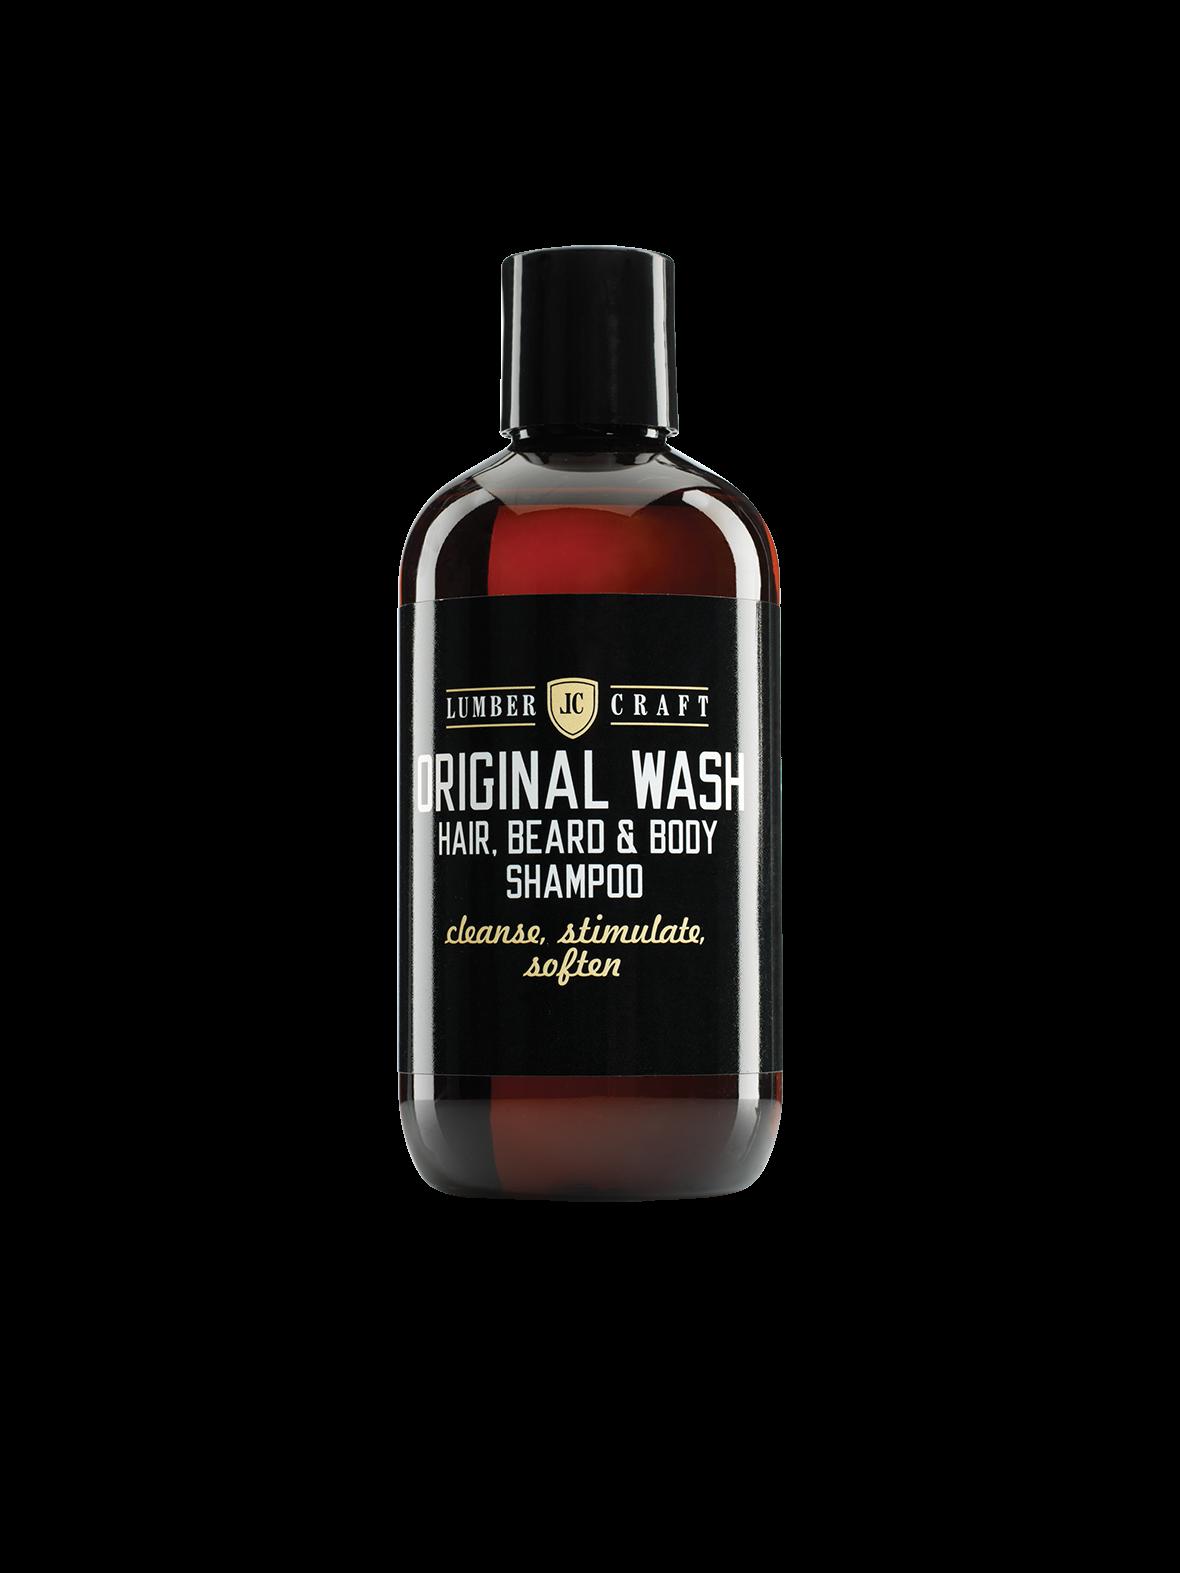 Lumber Craft Original Wash Shampoo - šampon na vlasy, vousy a tělo 250 ml Subrina